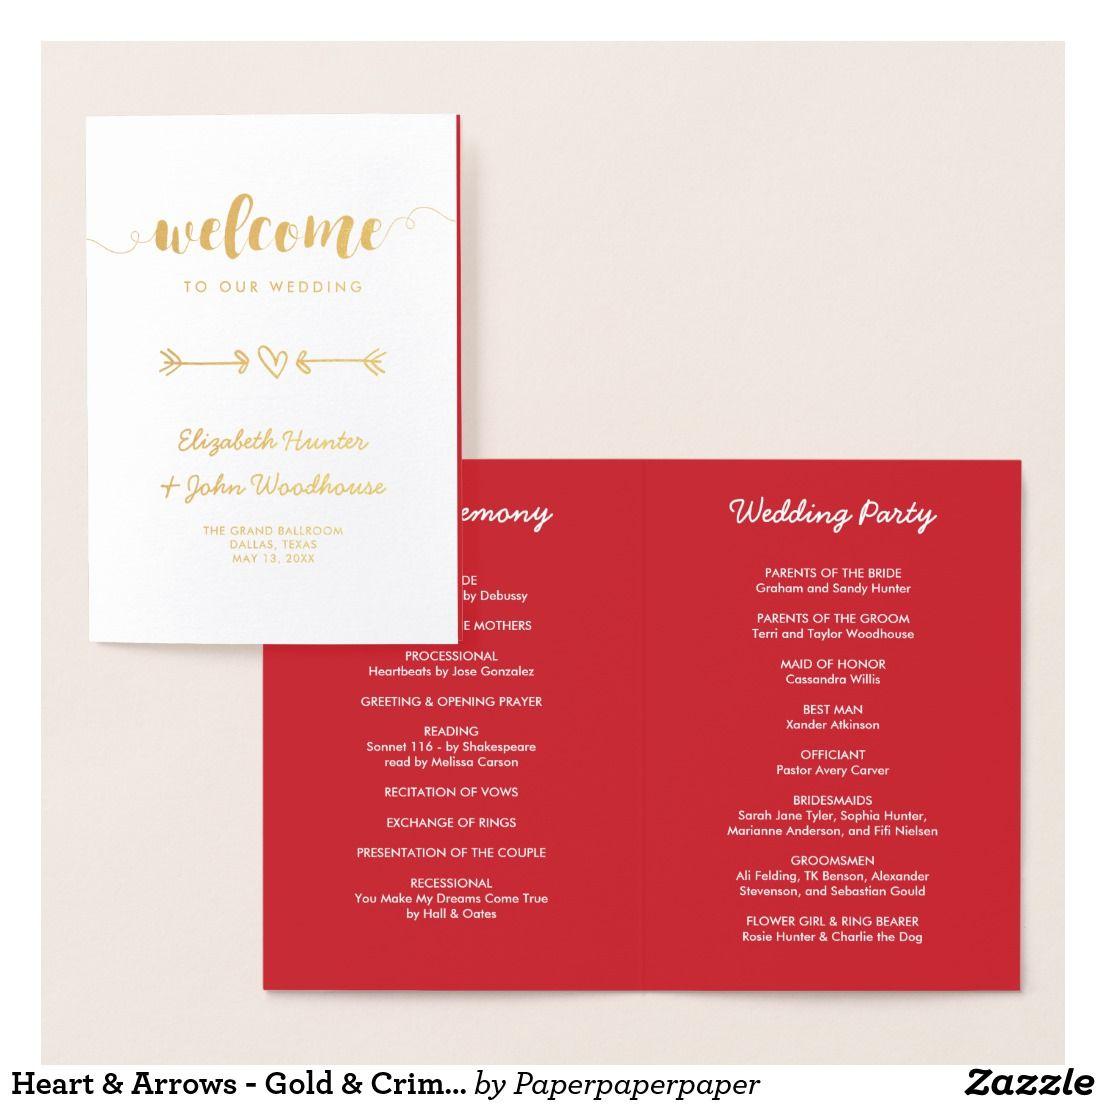 Heart & Arrows - Gold & Crimson - Wedding Program | Wedding programs ...